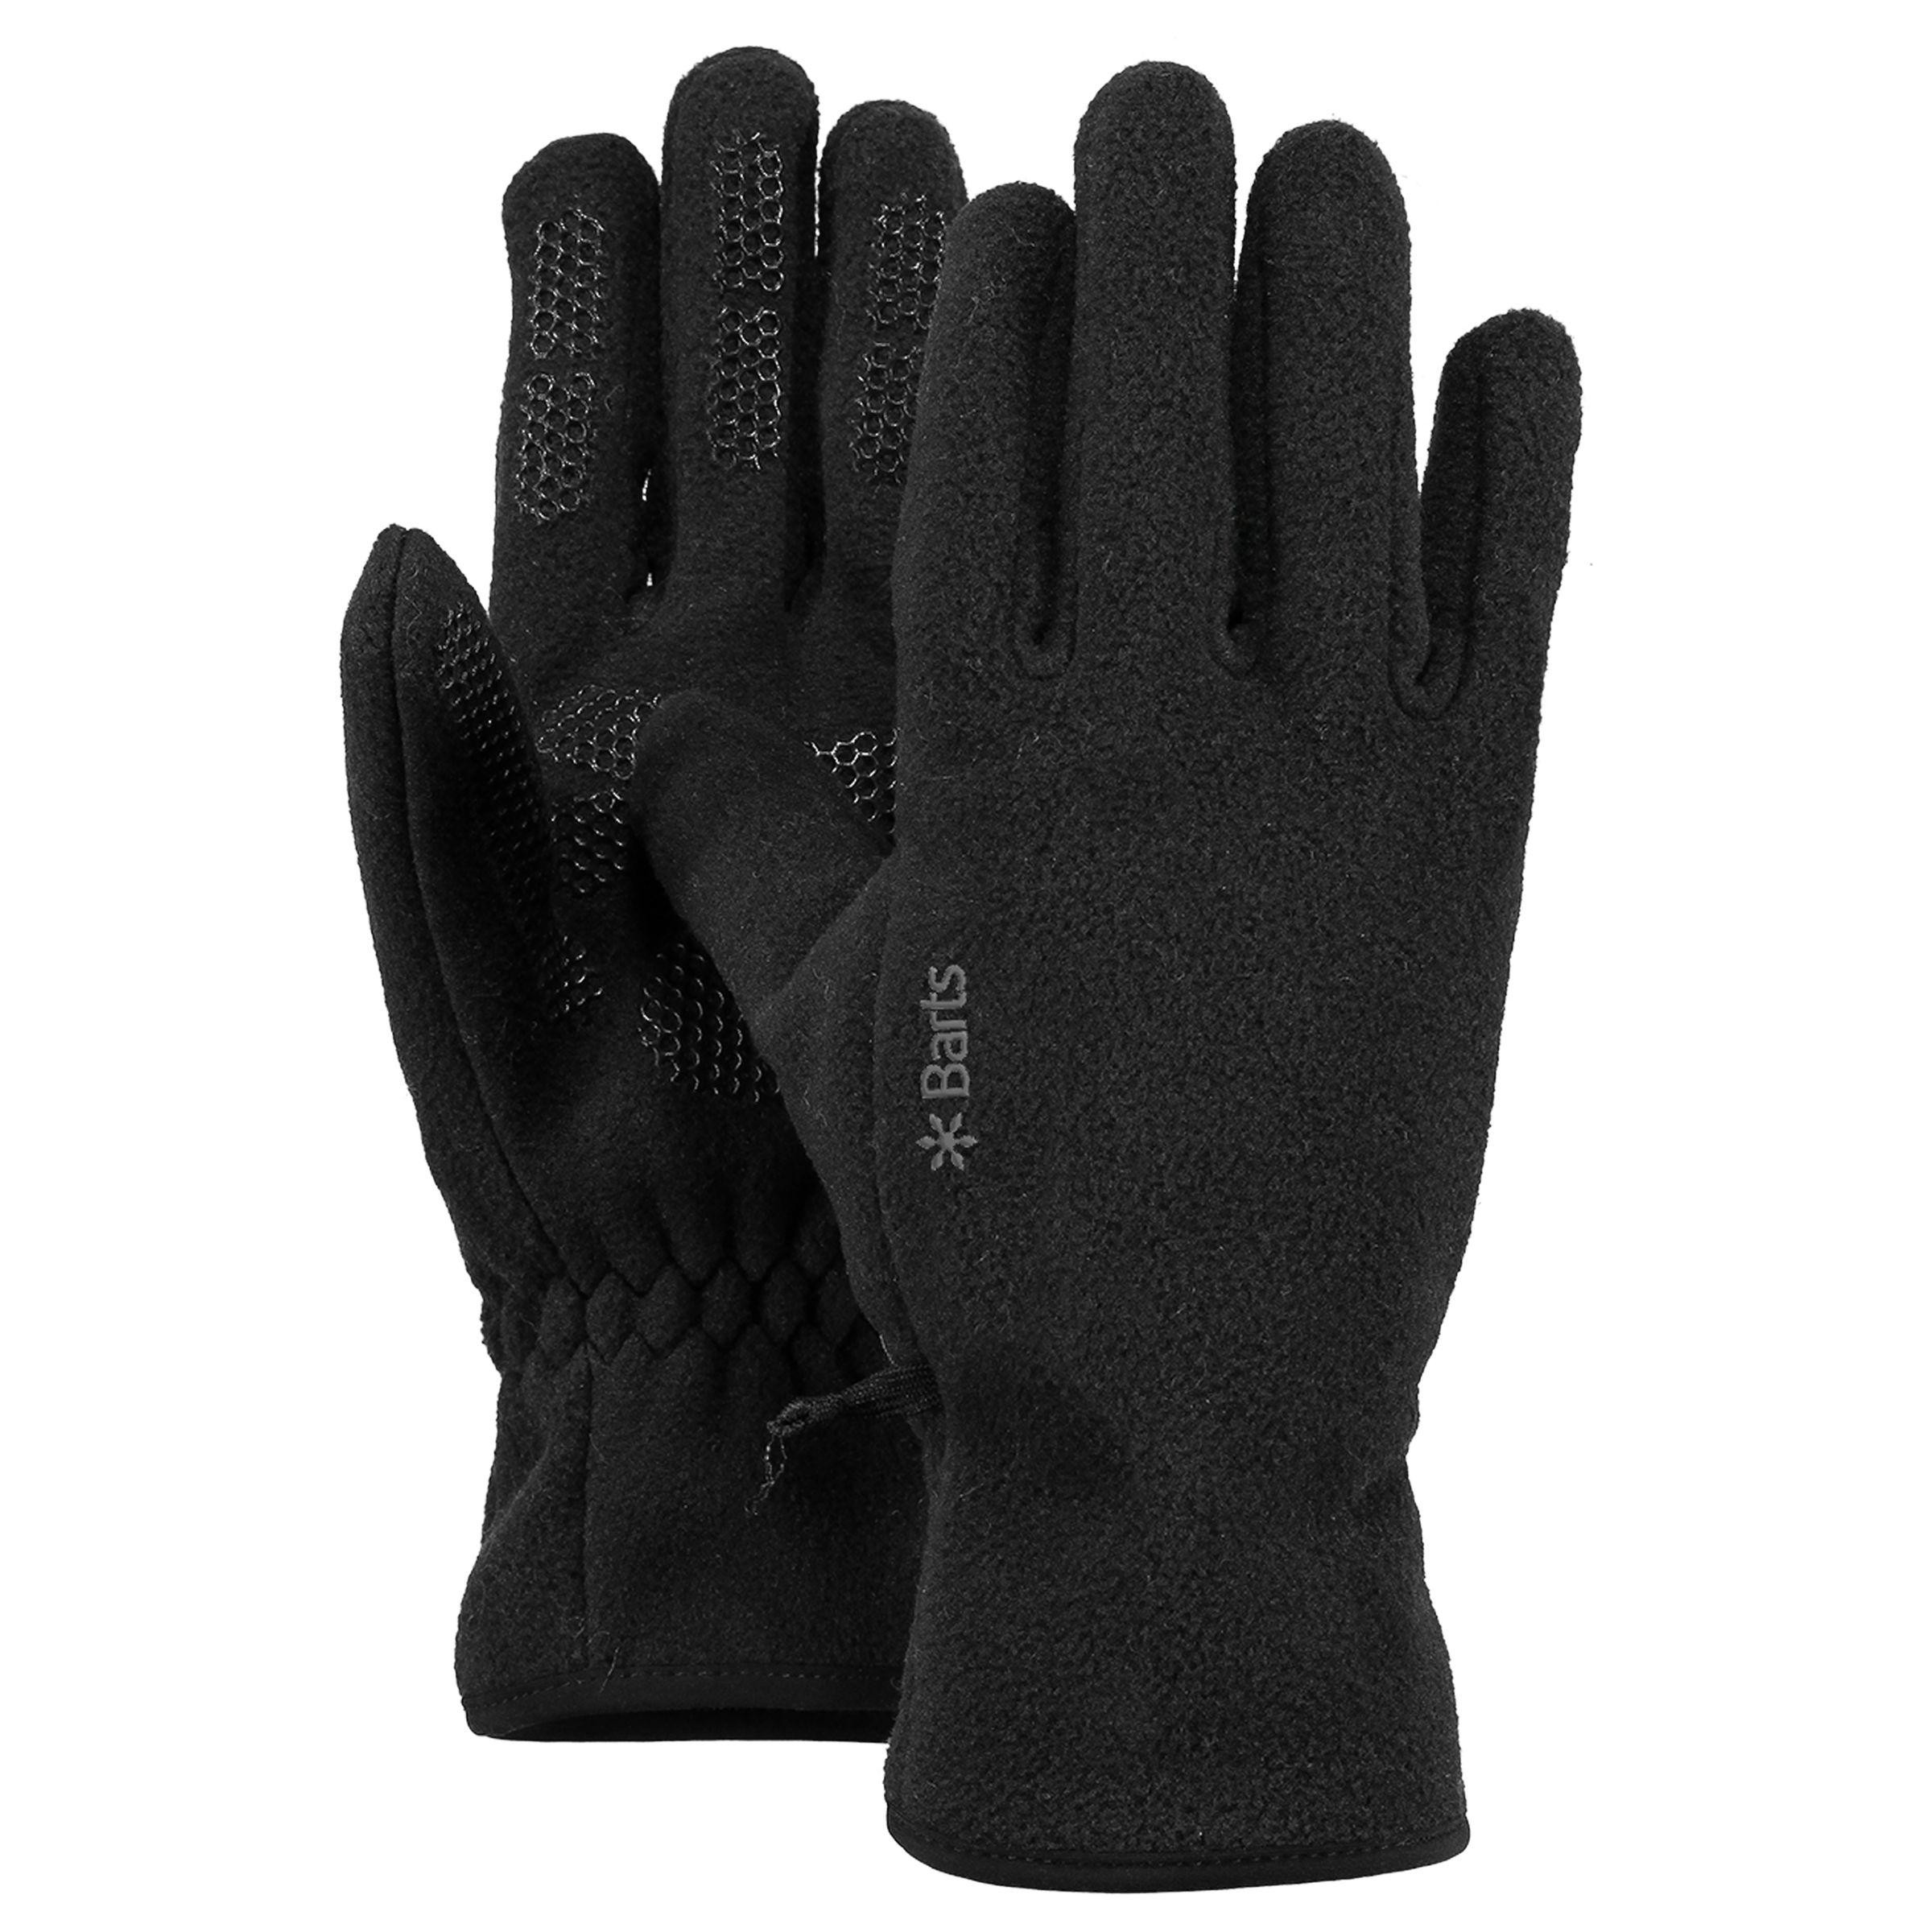 Barts Barts Fleece Gloves, Black